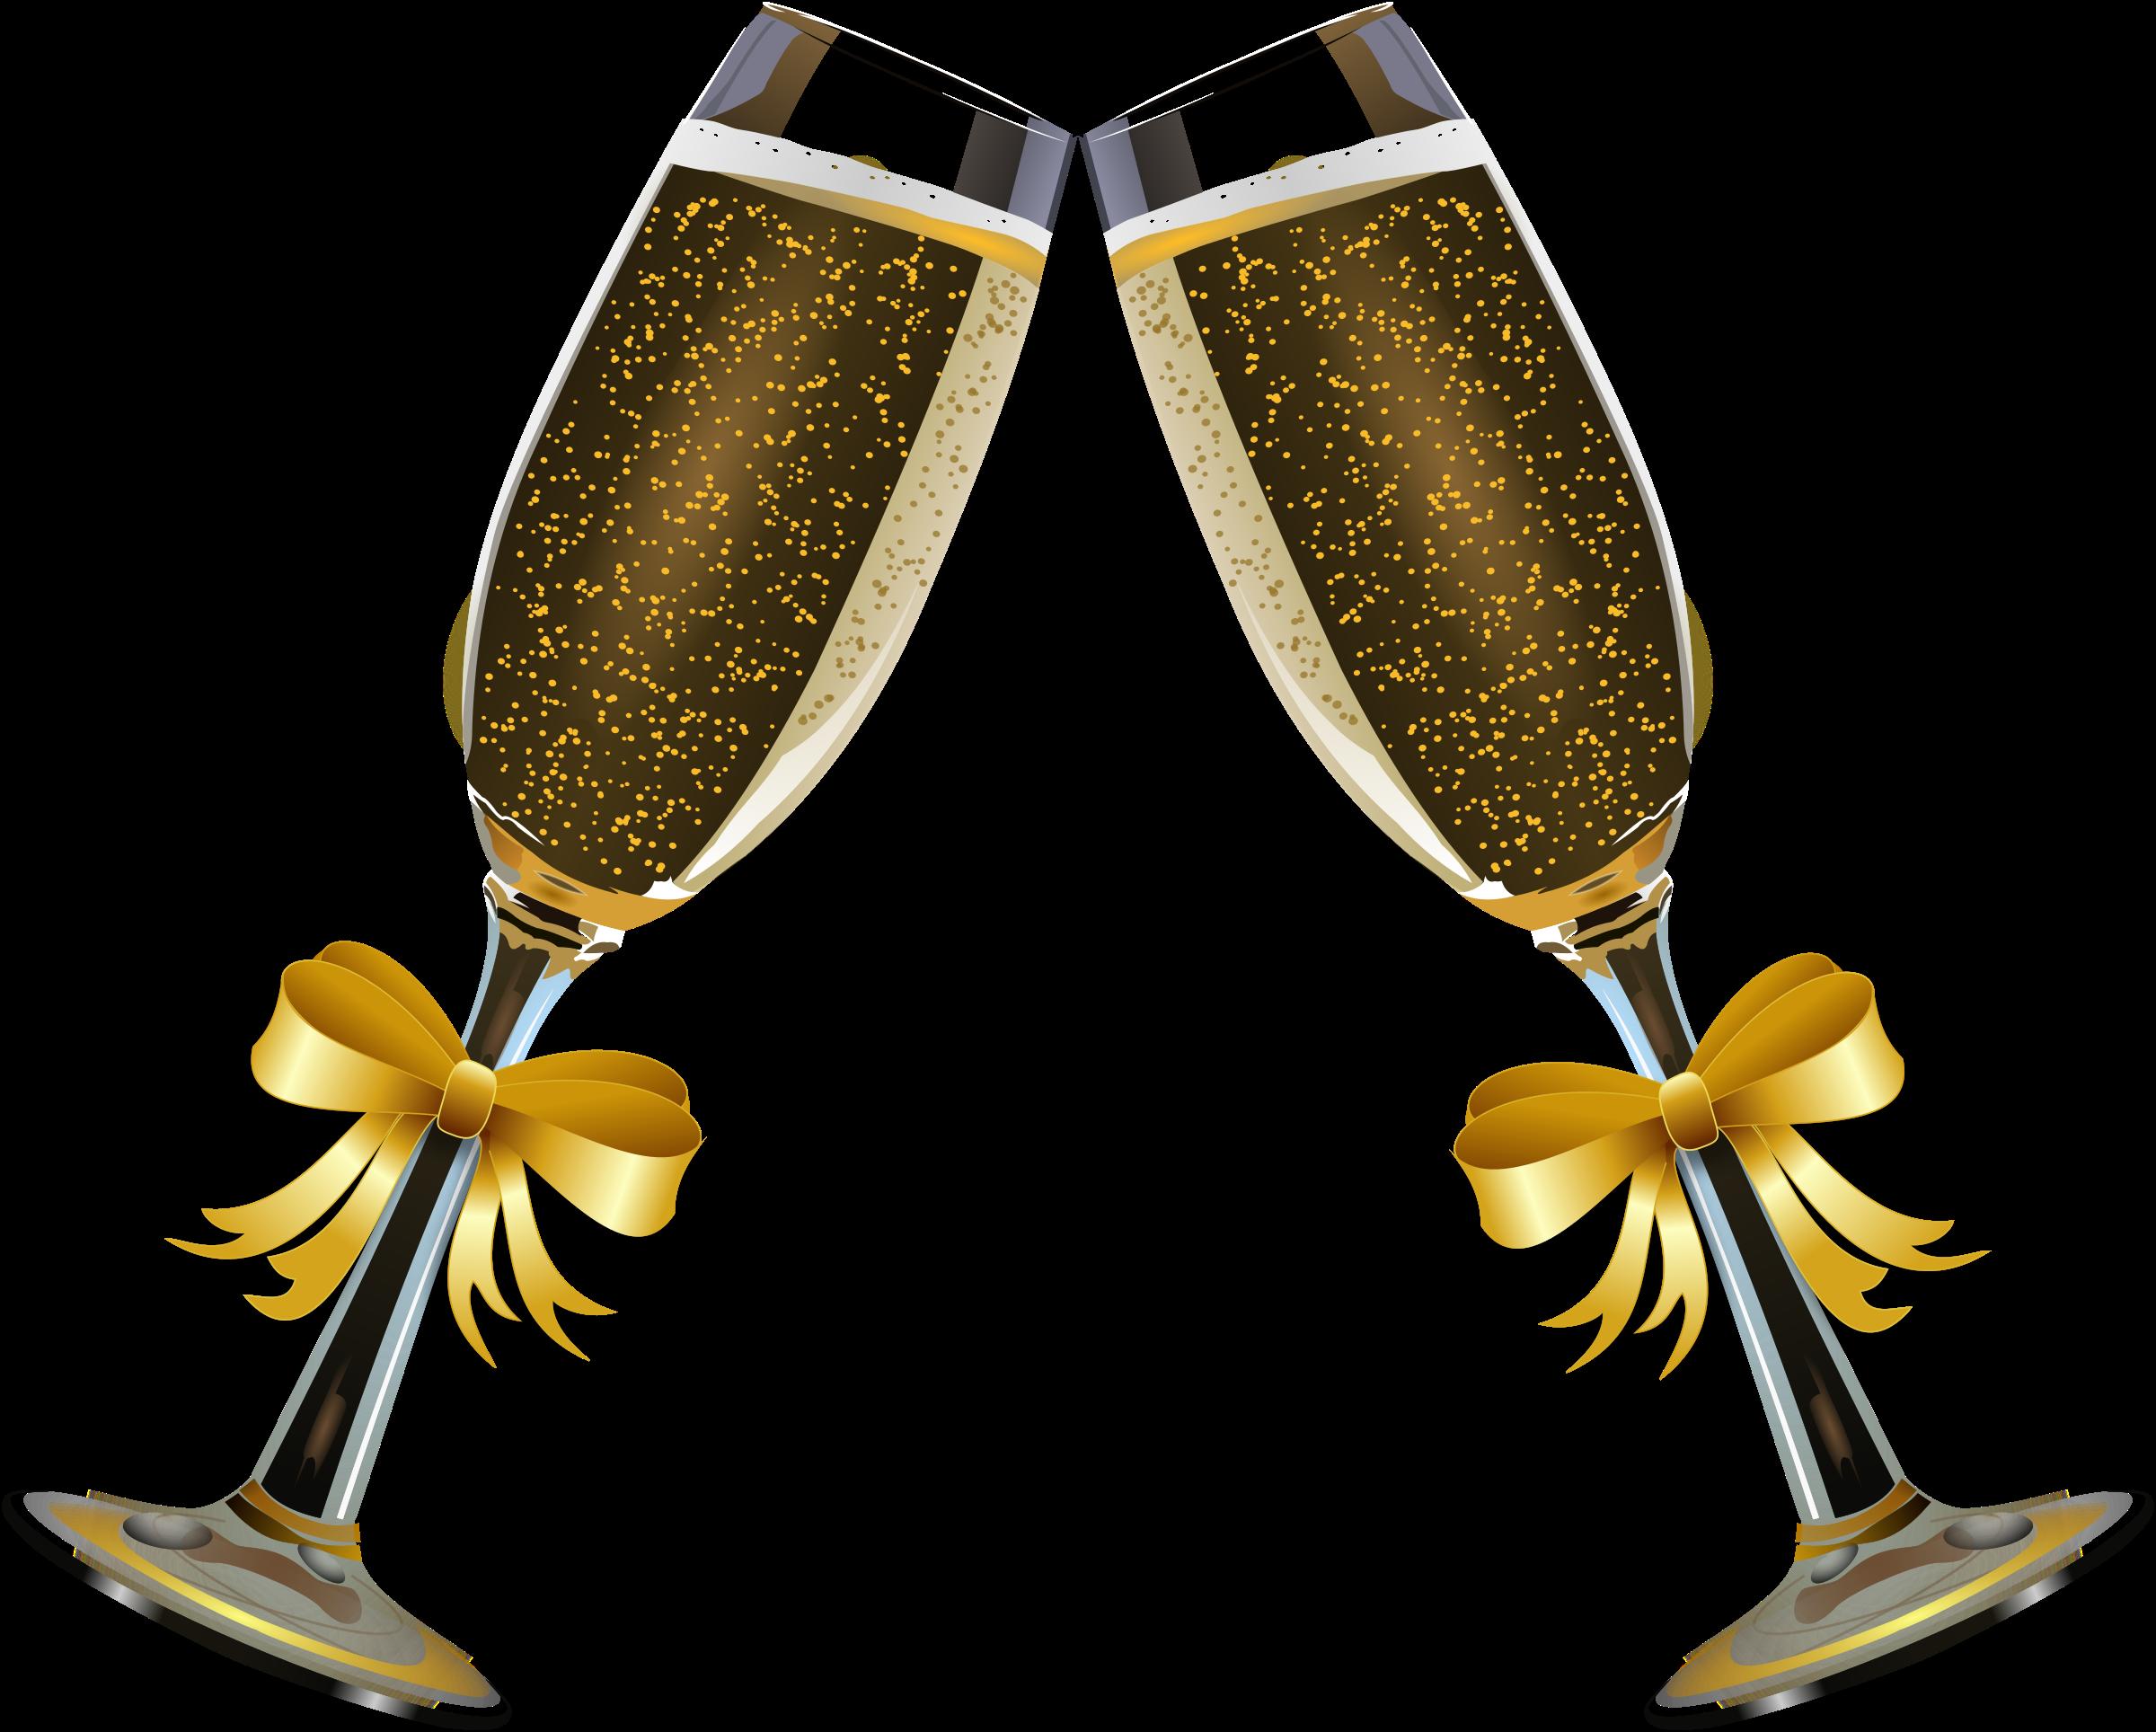 Clipart champagne glass remix 4